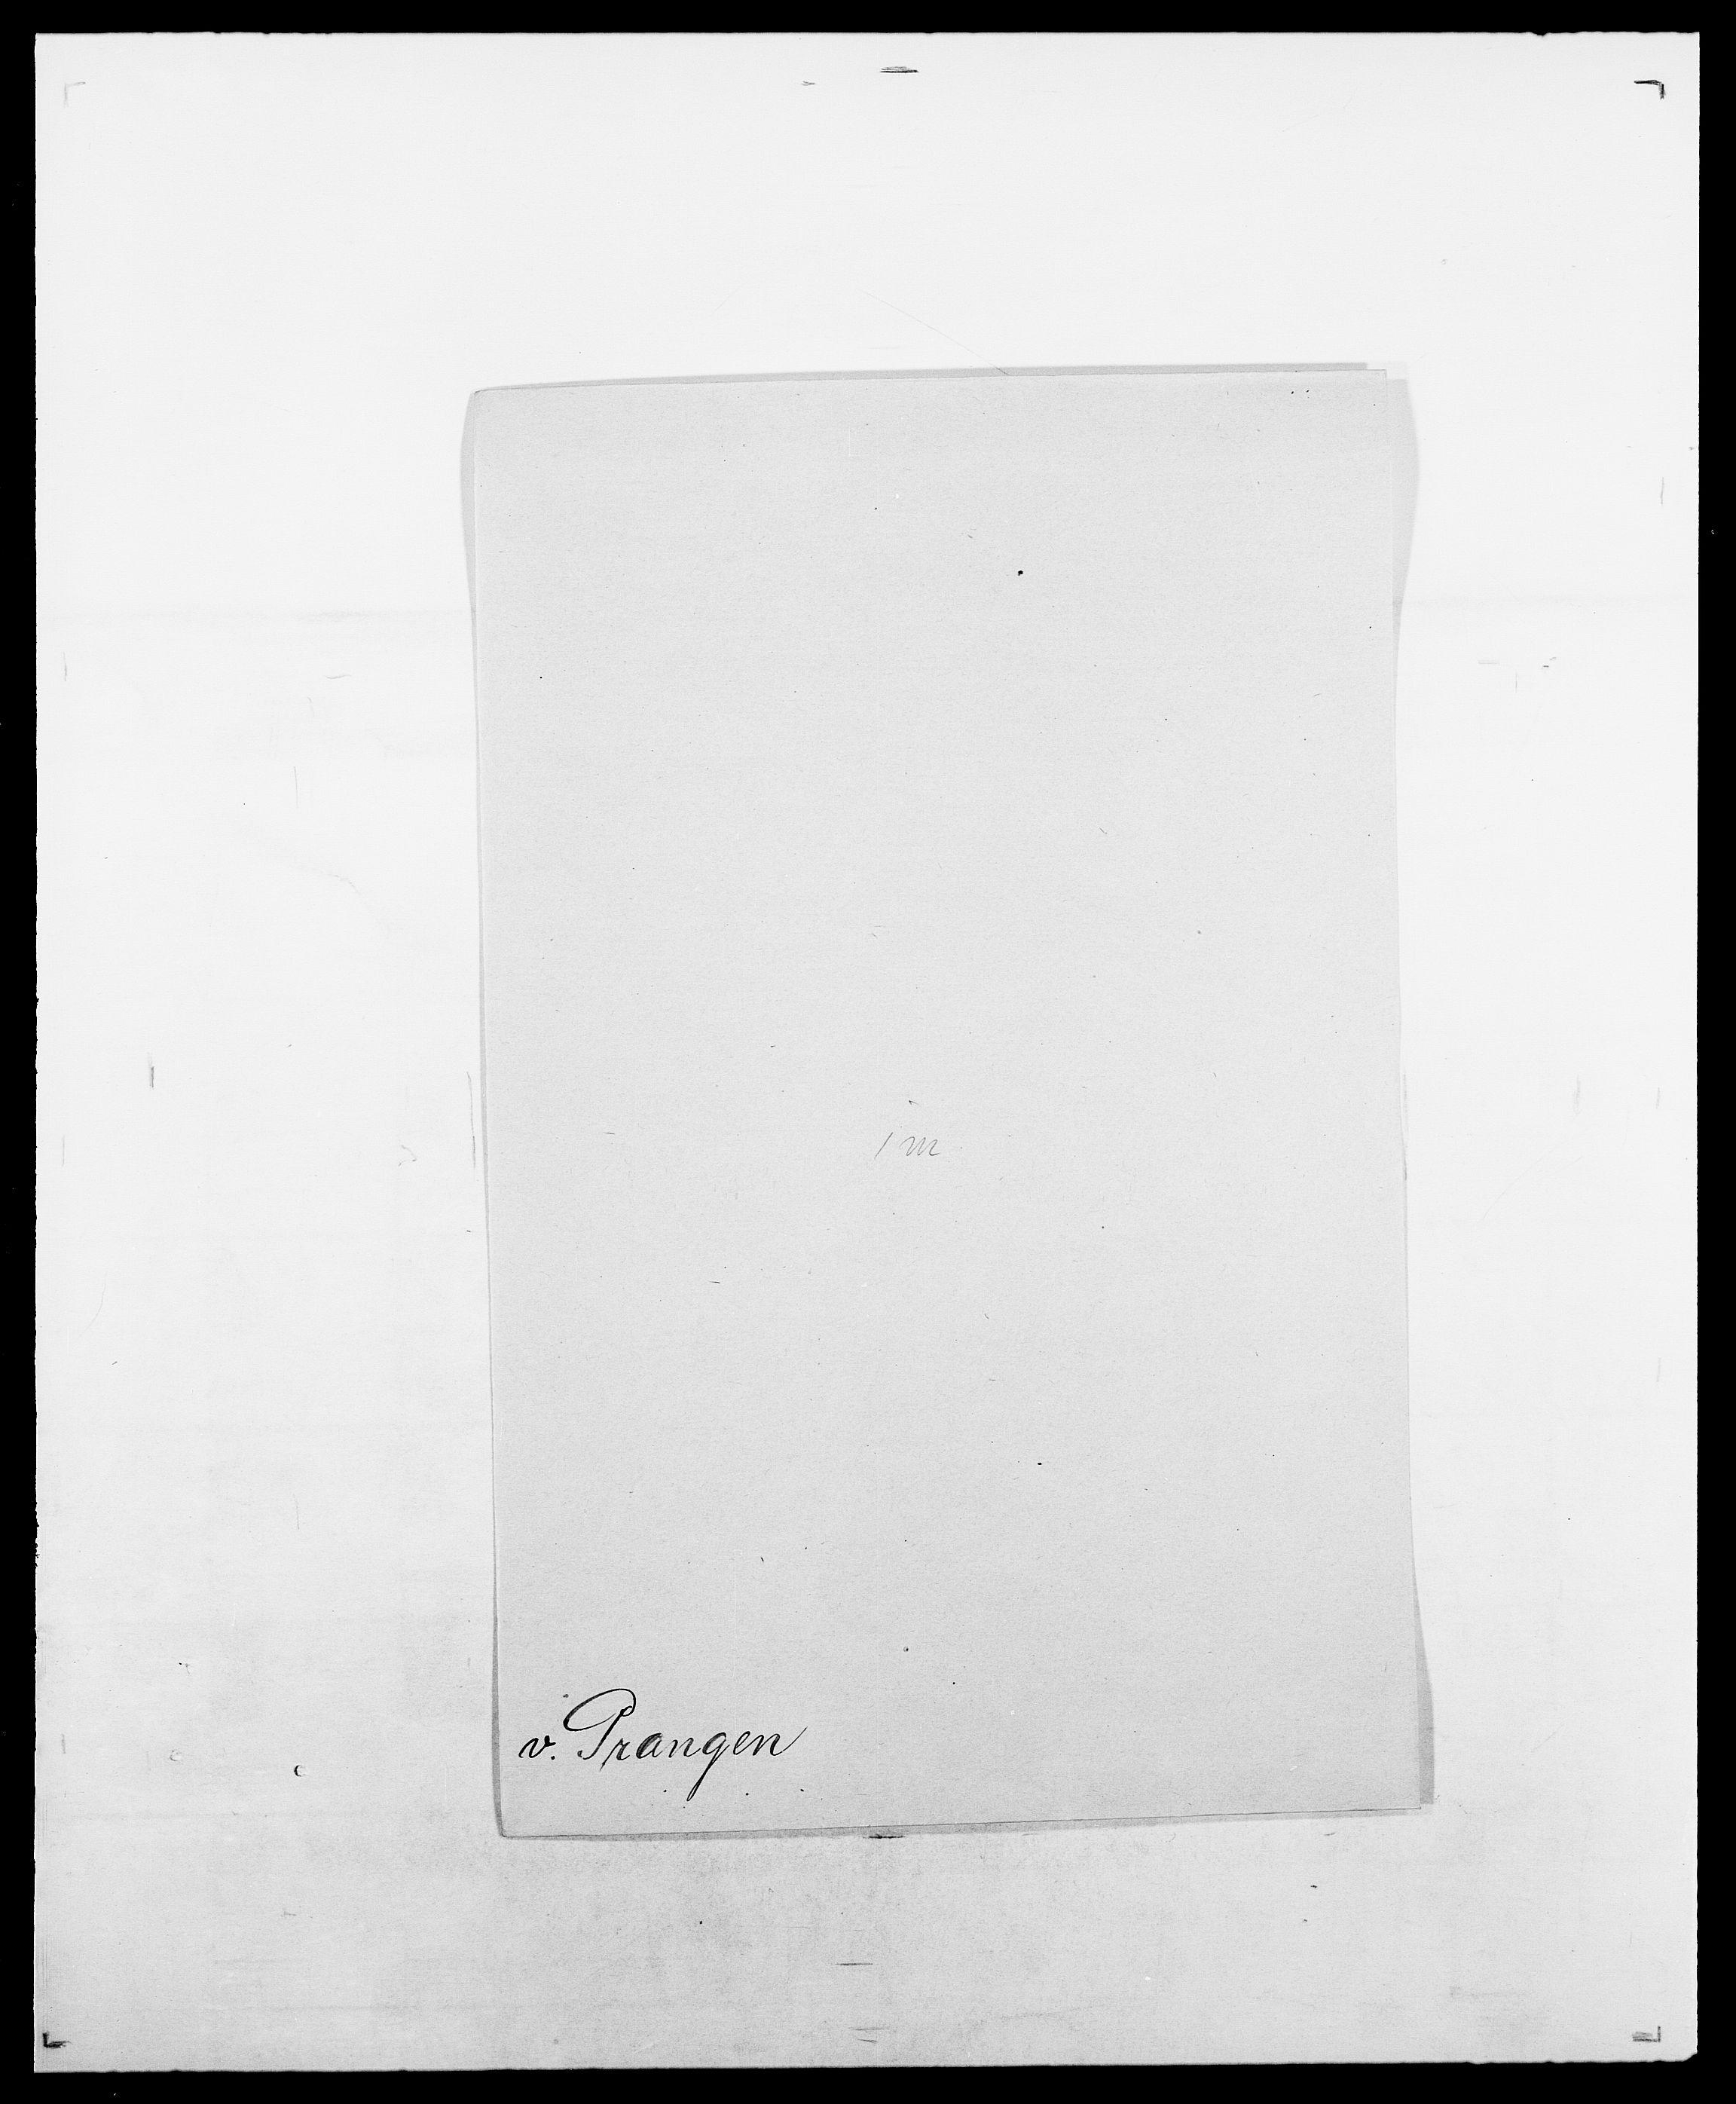 SAO, Delgobe, Charles Antoine - samling, D/Da/L0031: de Place - Raaum, s. 294